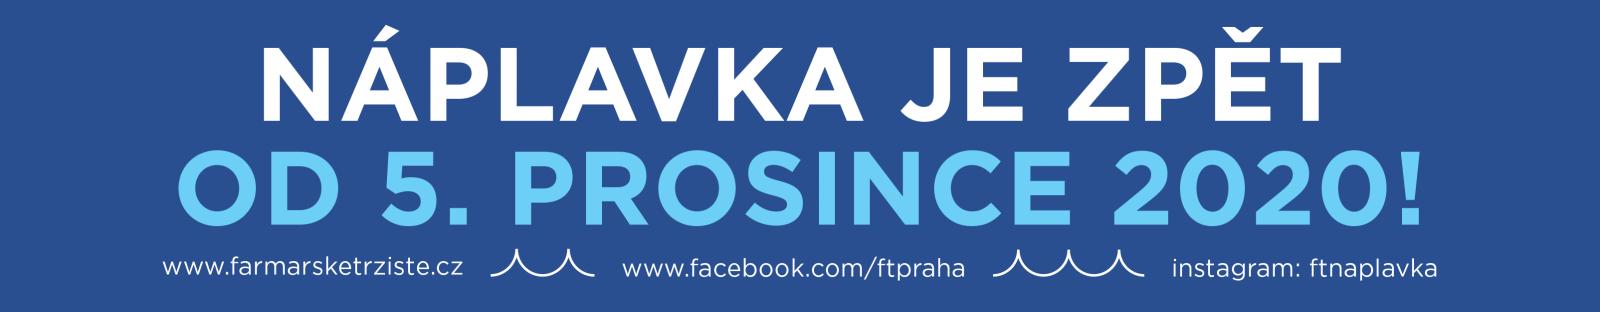 https://www.farmarsketrziste.cz/wp-content/uploads/naplavka-2020-web-770x150-vol5.png